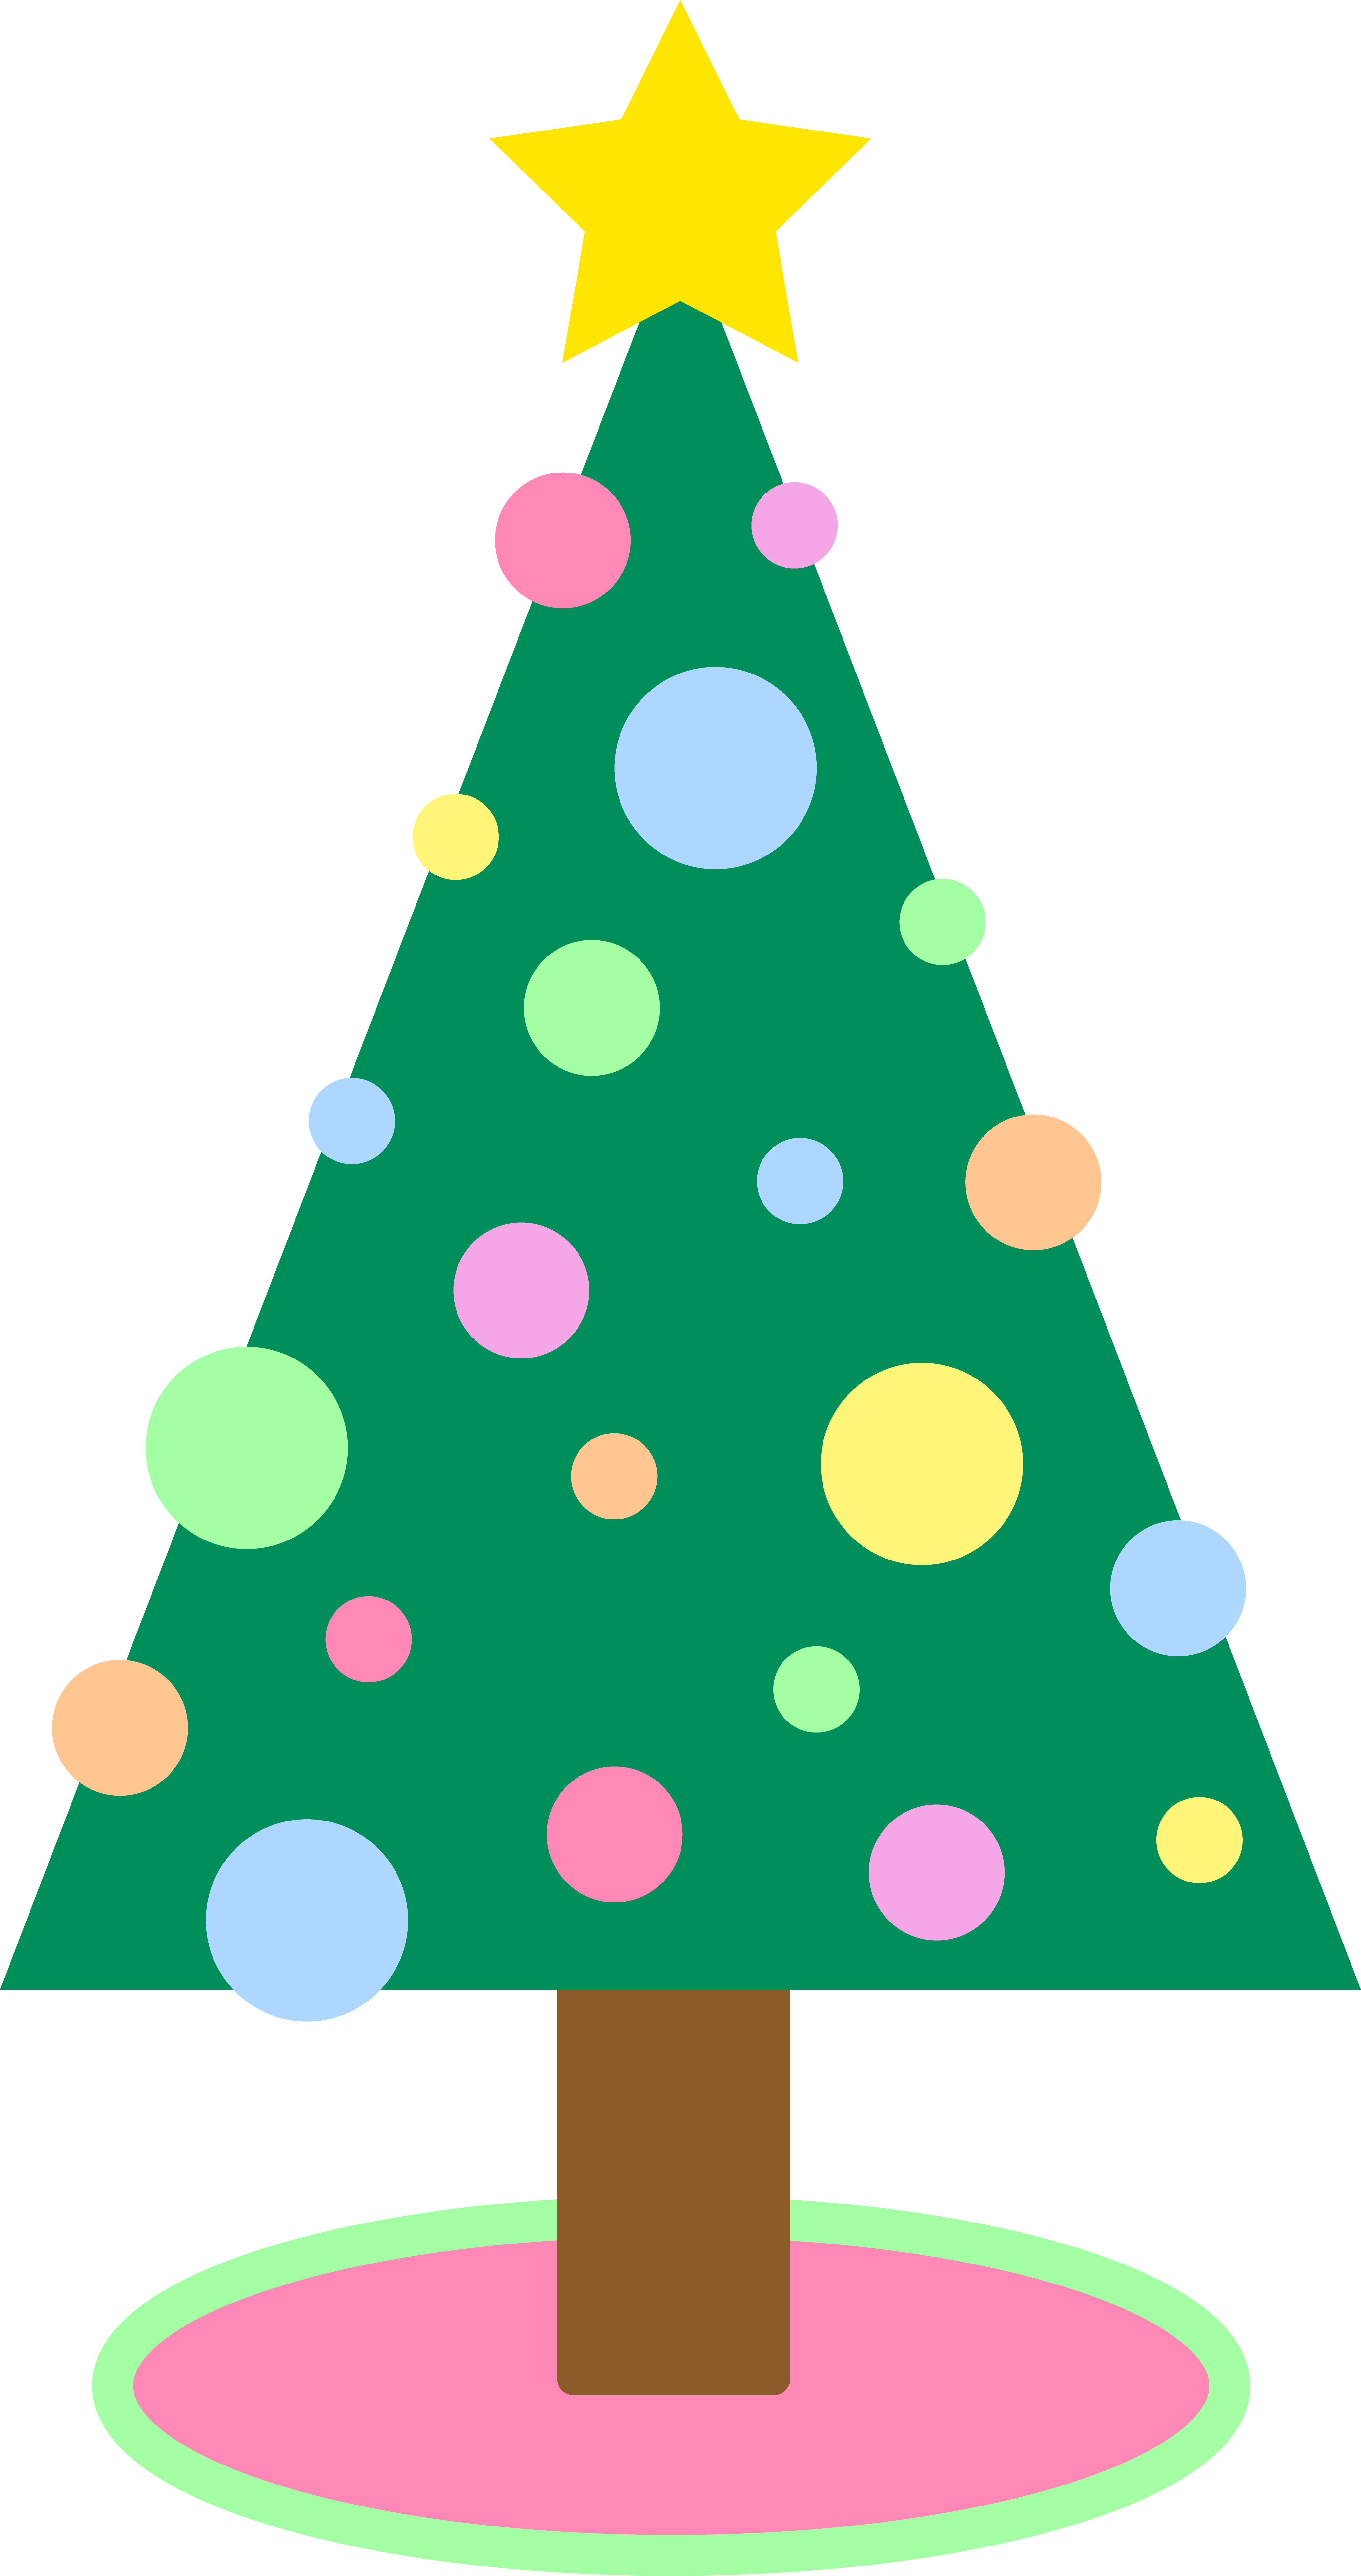 4150x7856 Free Christmas Tree Clipart Public Domain Clip Art 4 3